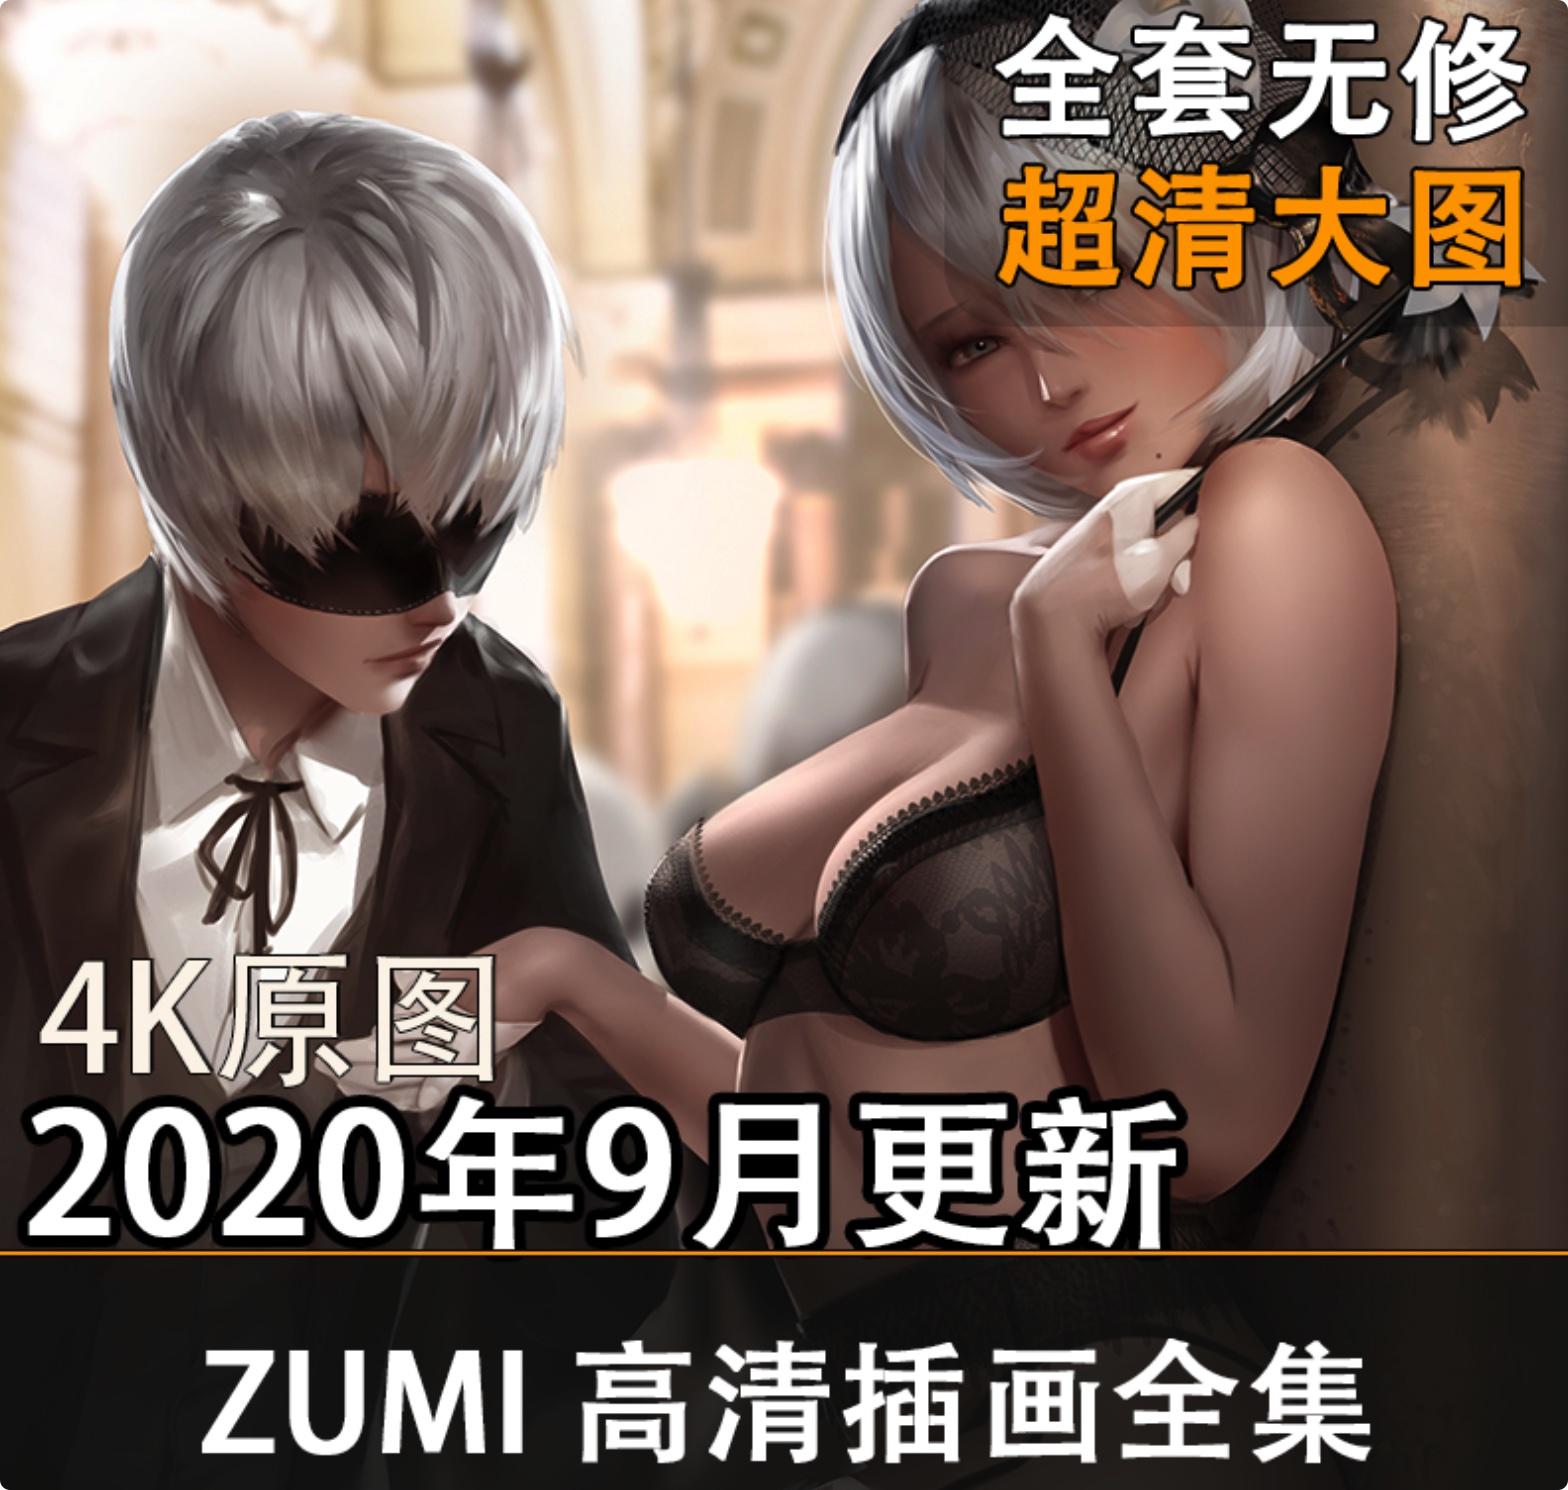 ZUMI日韩超清4K动漫插画原画P站素材下载